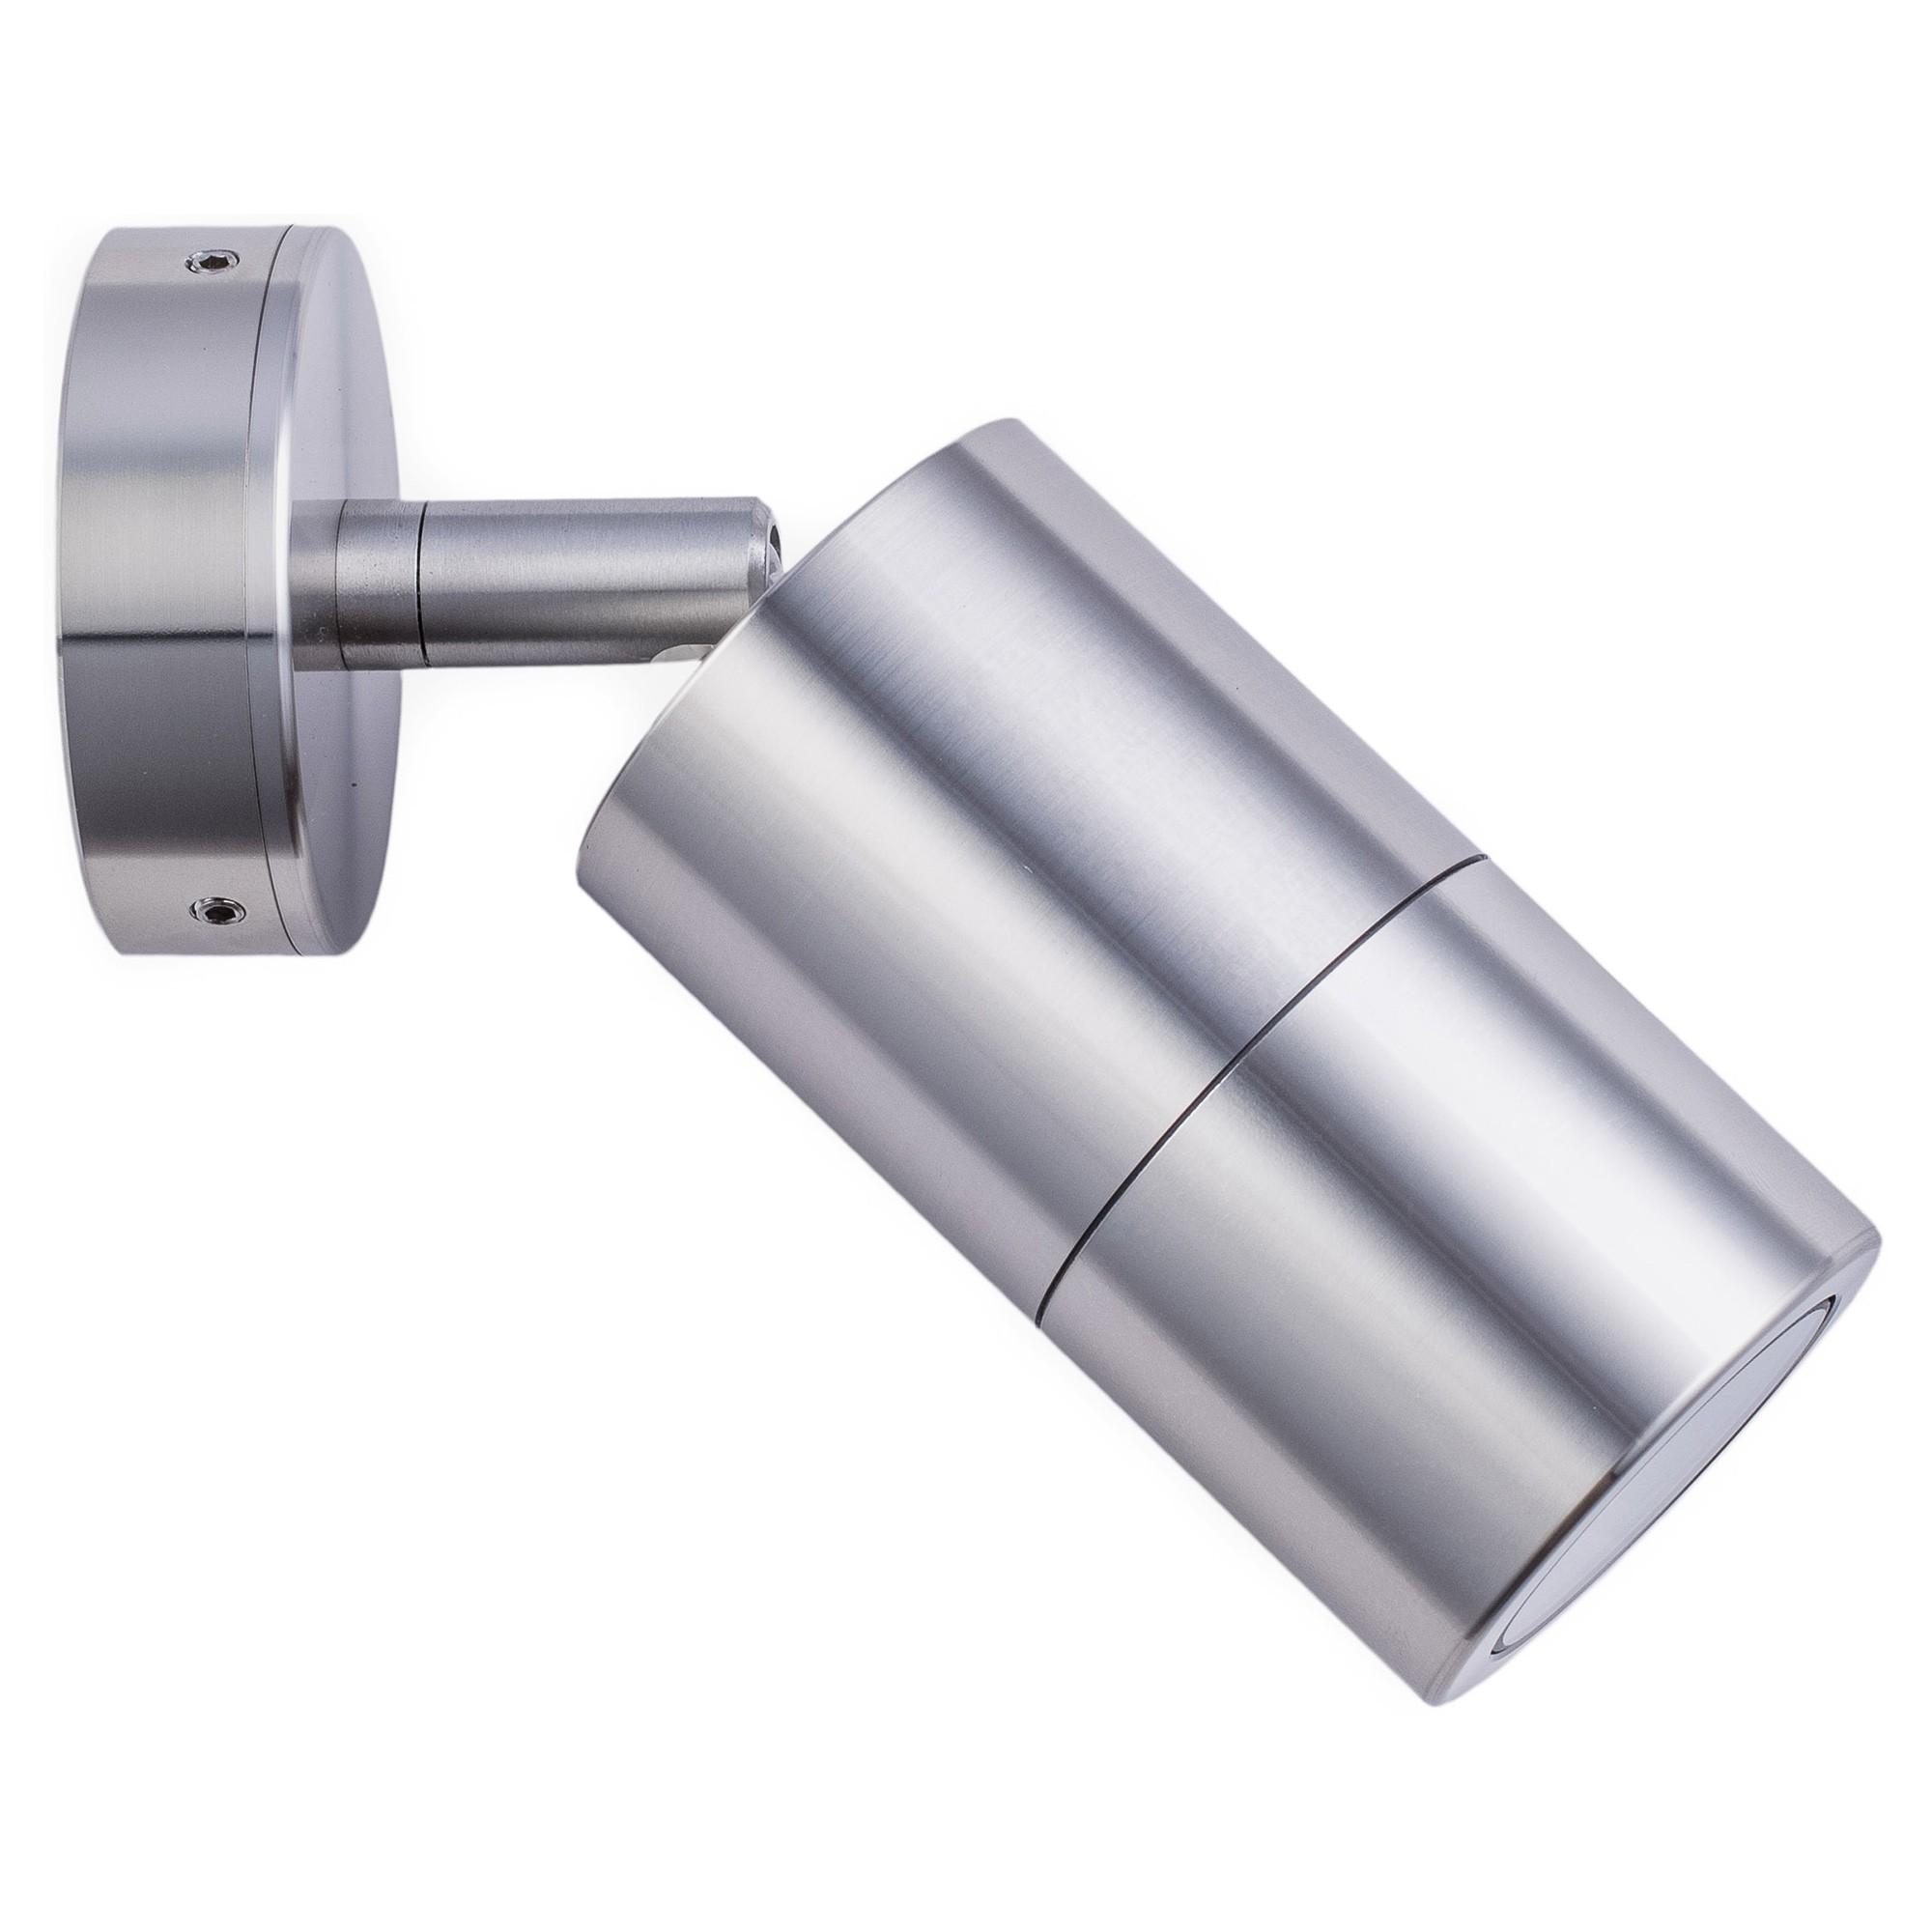 Roslin IP65 Exterior Single Adjustable Wall Light, GU10, Anodized Aluminium